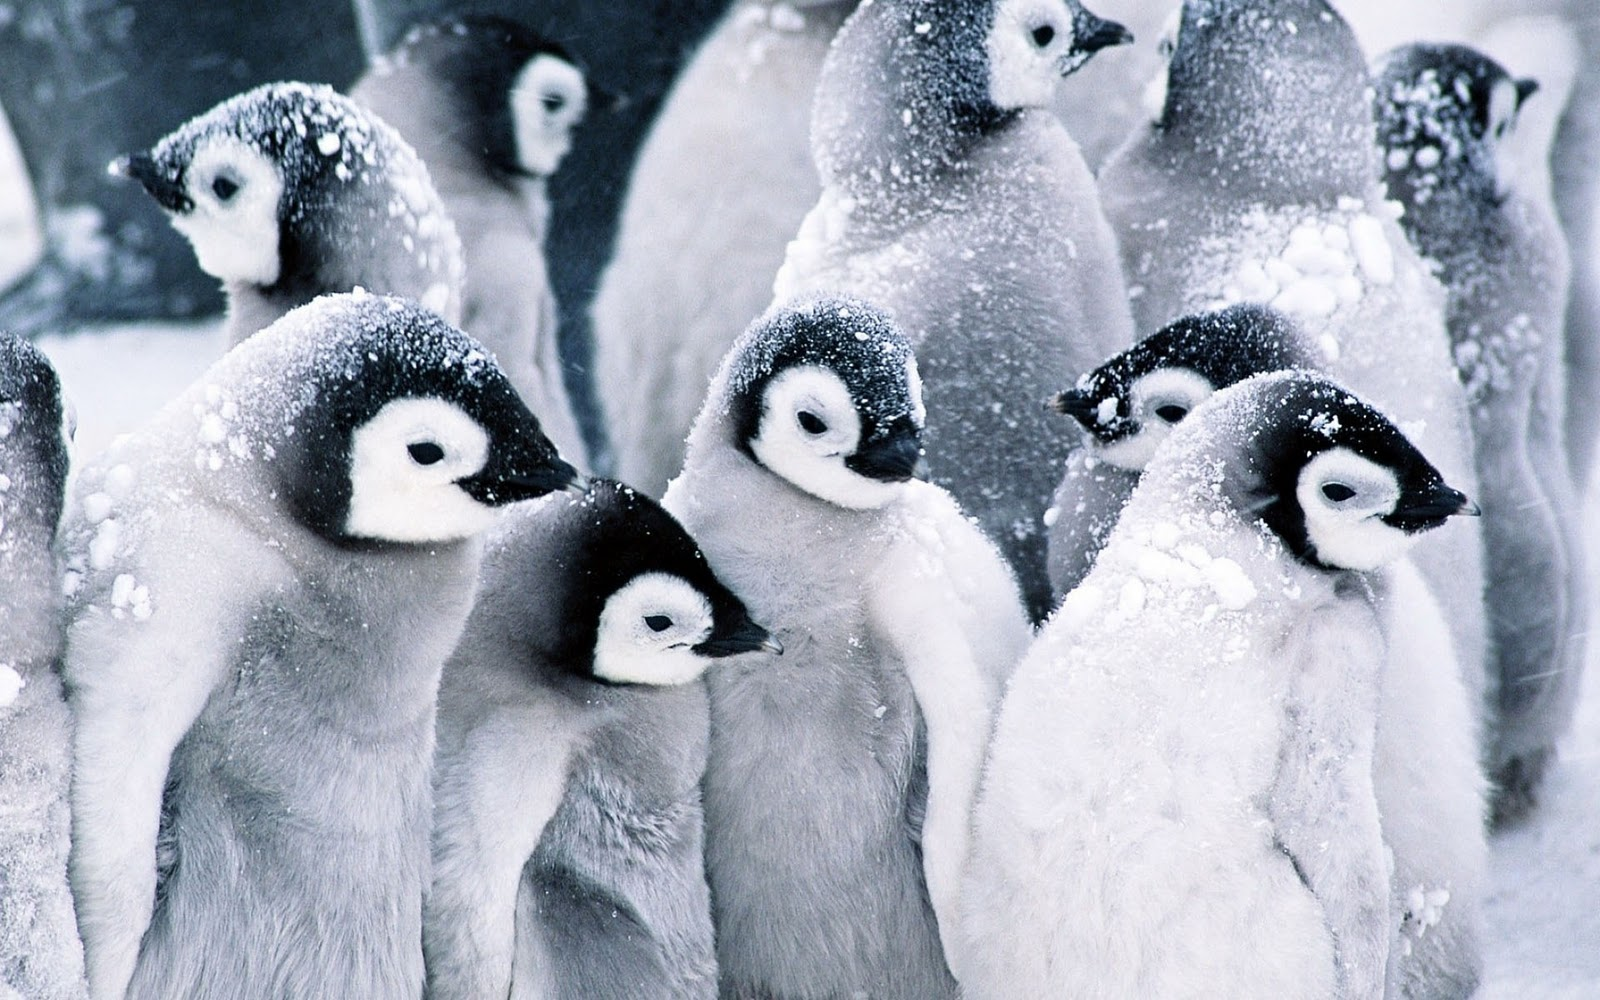 pinguin achtergronden hd wallpapers penguin clip art black and white penguin clipart free